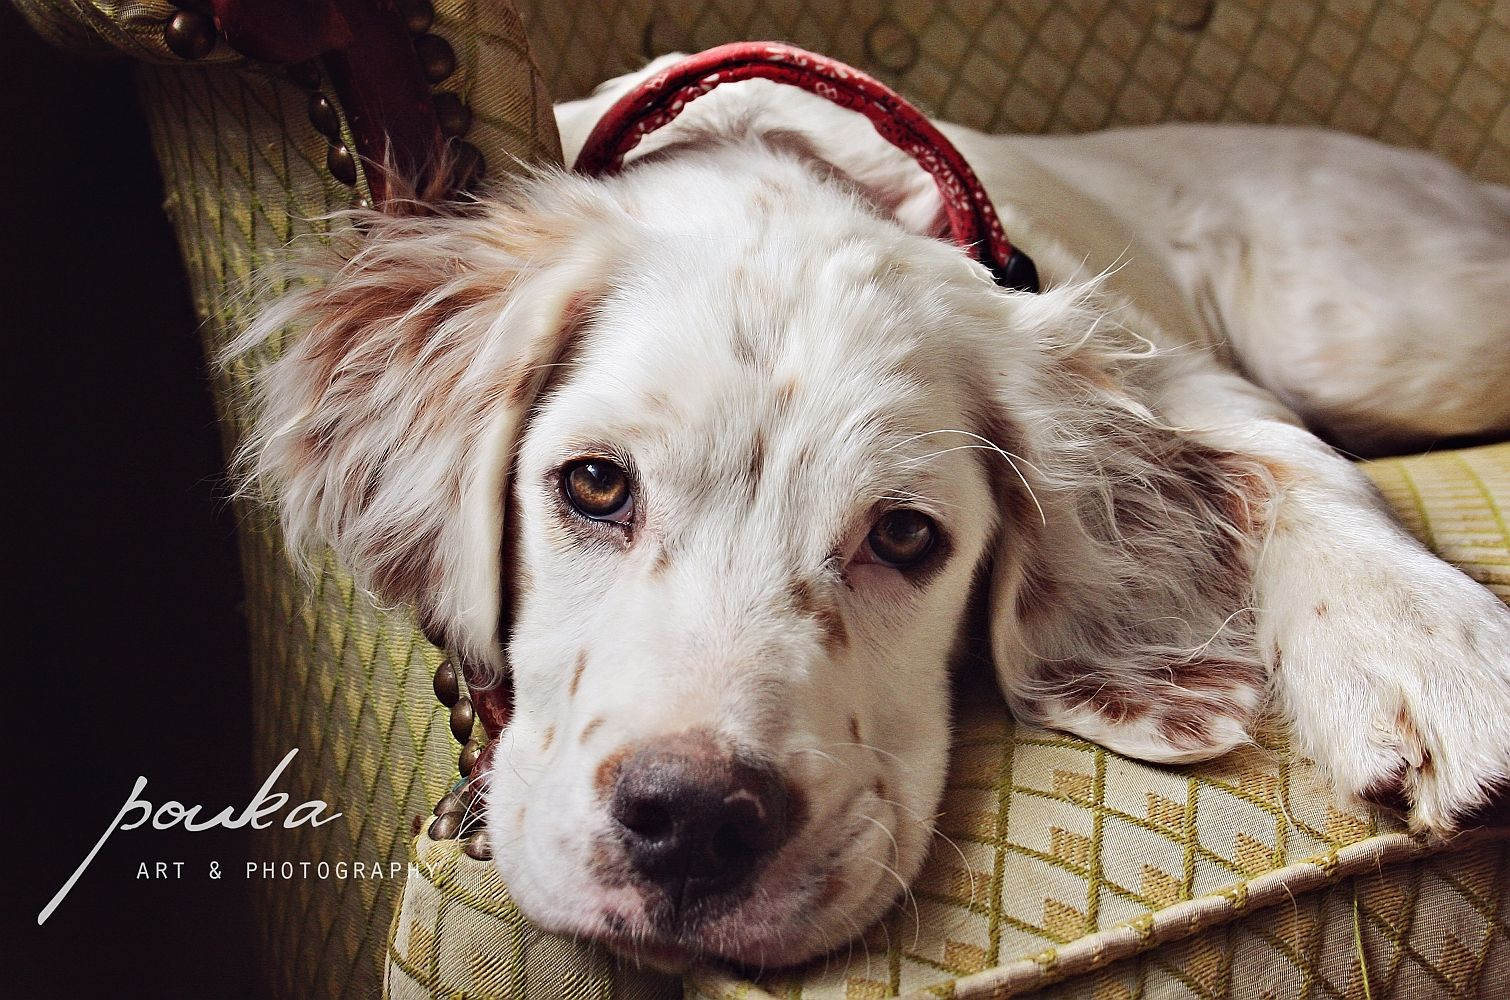 English Setter puppy portrait. Popper. English setter